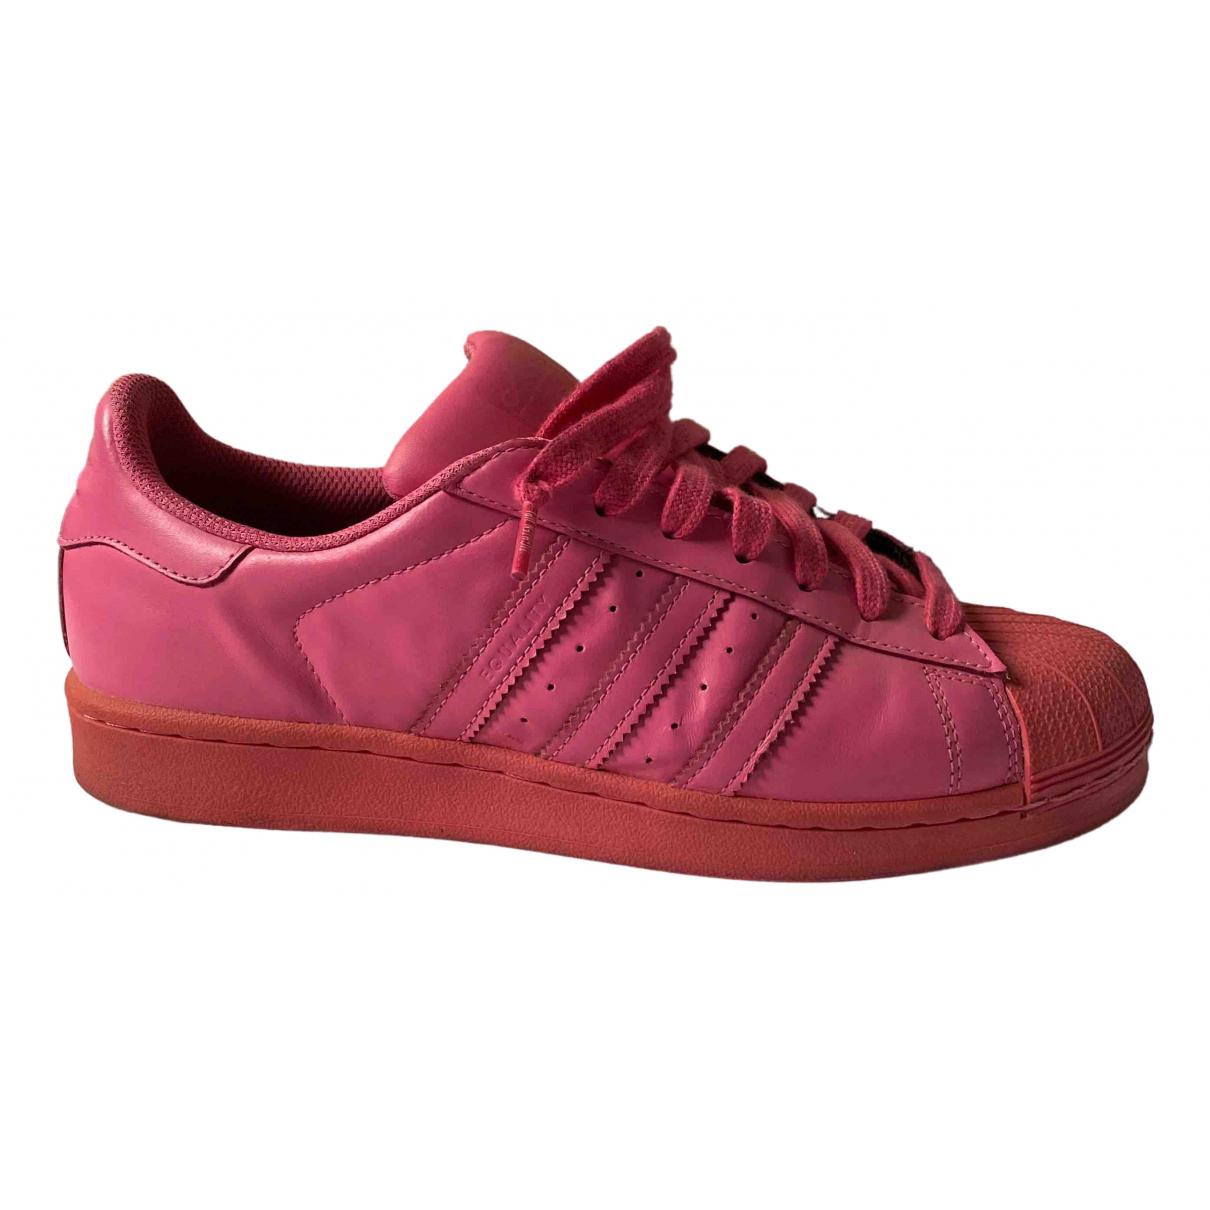 Adidas Superstar Sneakers in  Rosa Leder